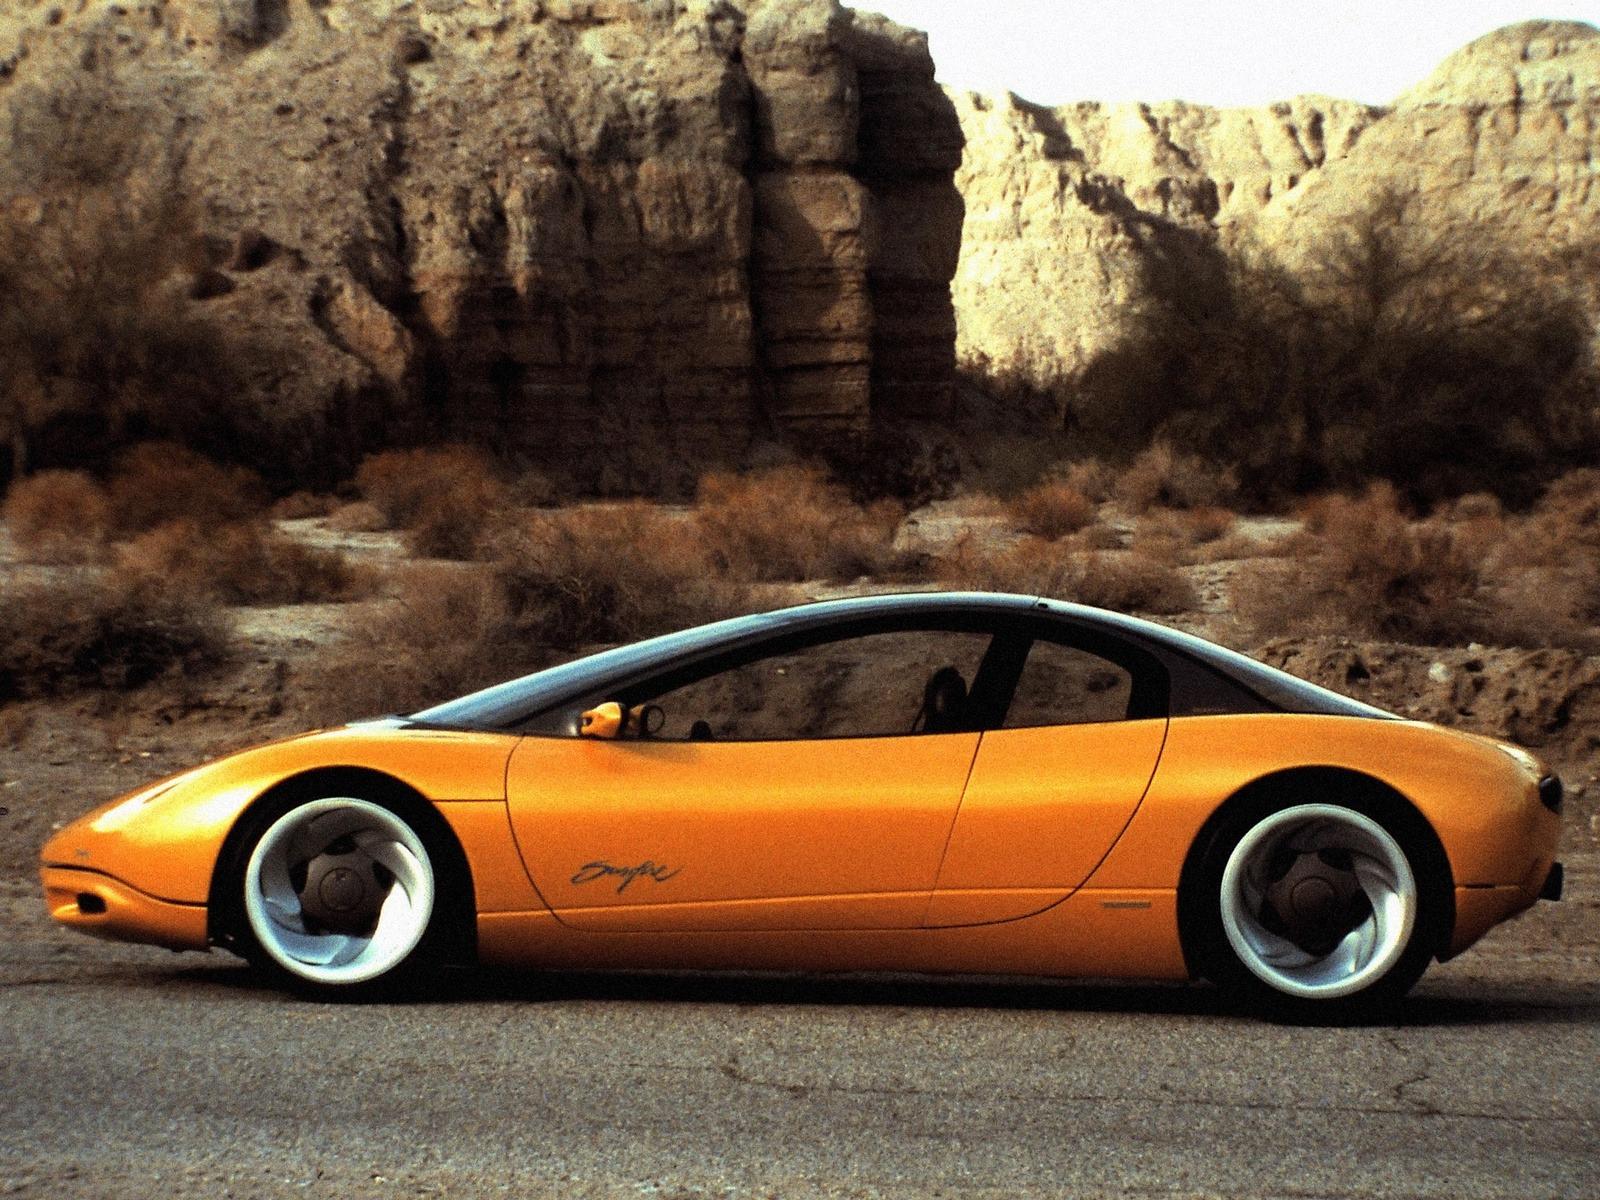 Pontiac Sunfire Concept (1990) - Old Concept Cars